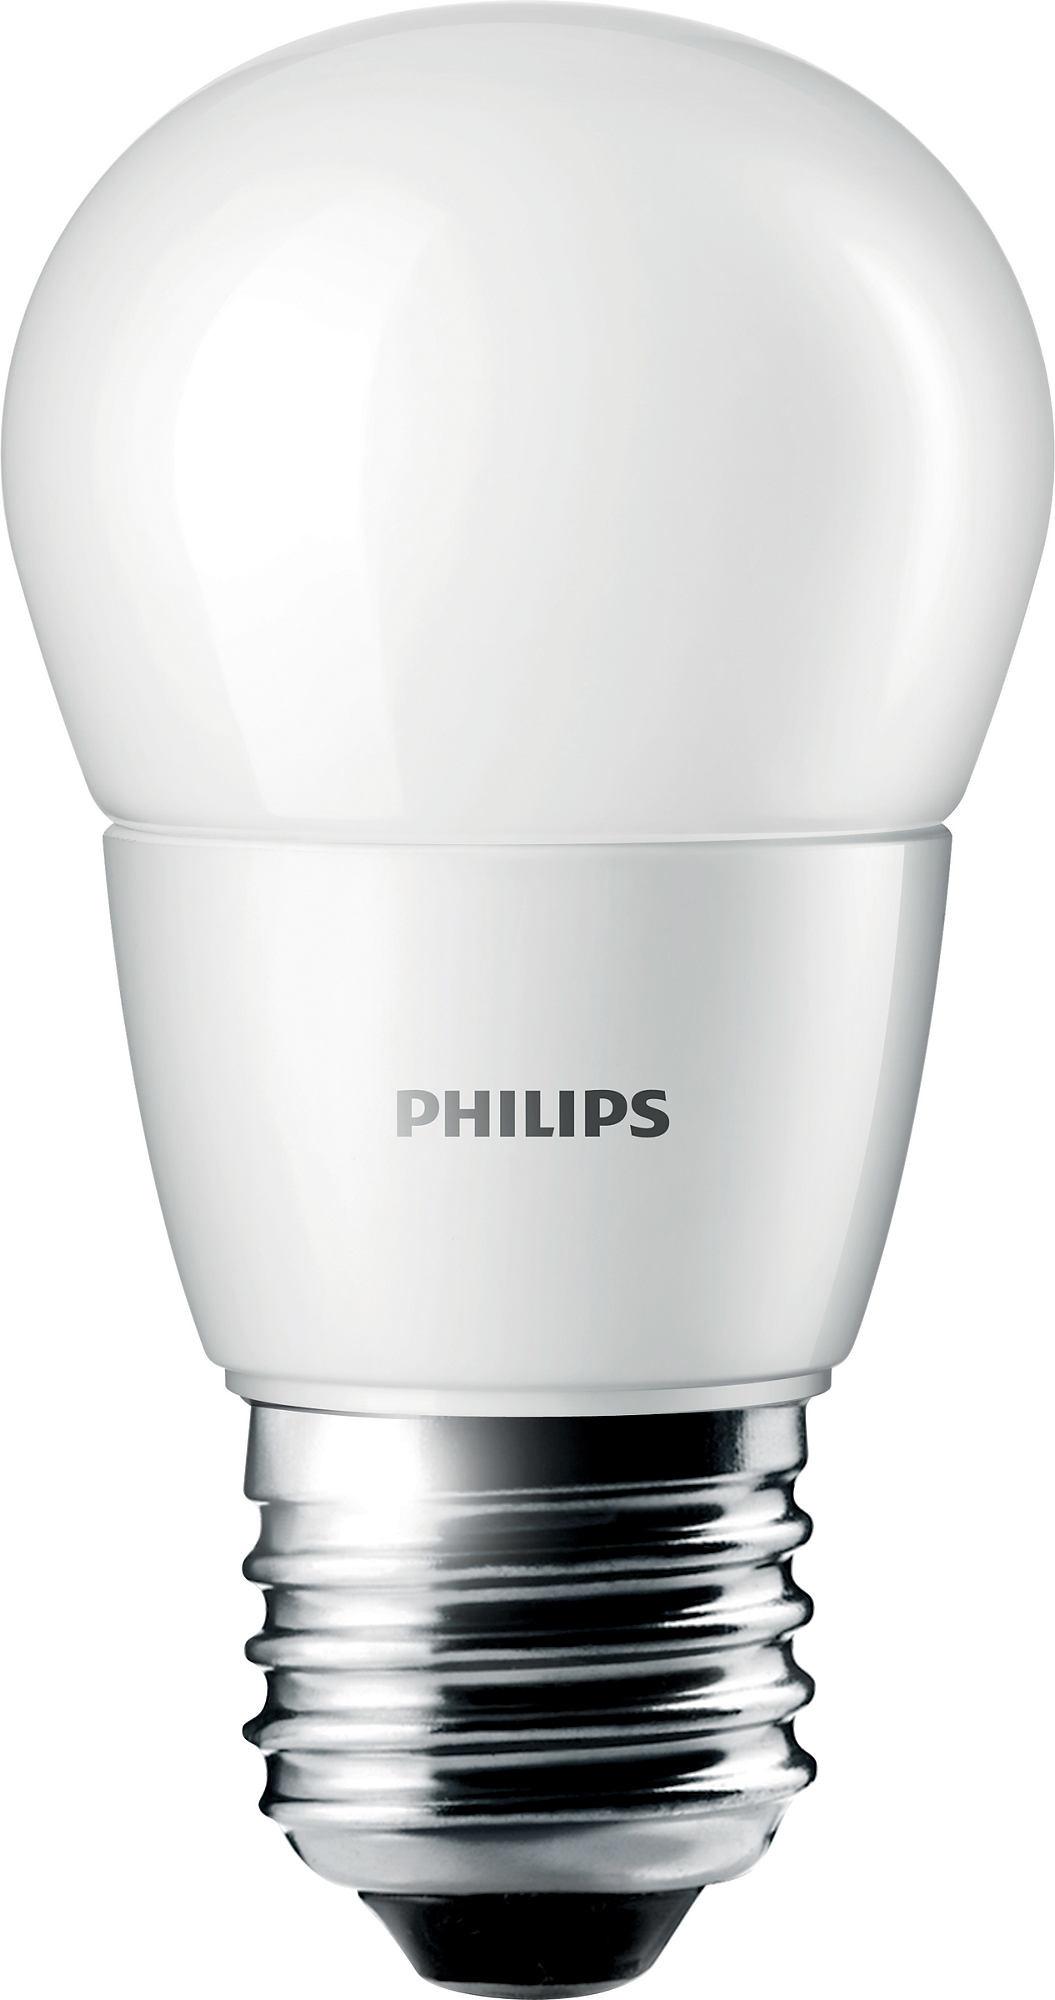 Philips CorePro LEDluster 2.7-25W E27 827 P48 FR